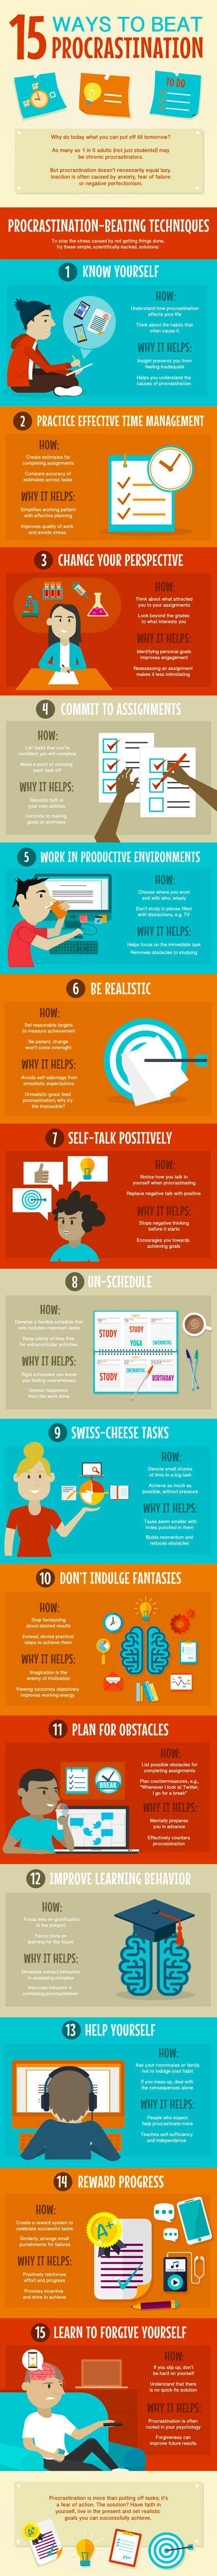 15 ways to overcome procrastination.